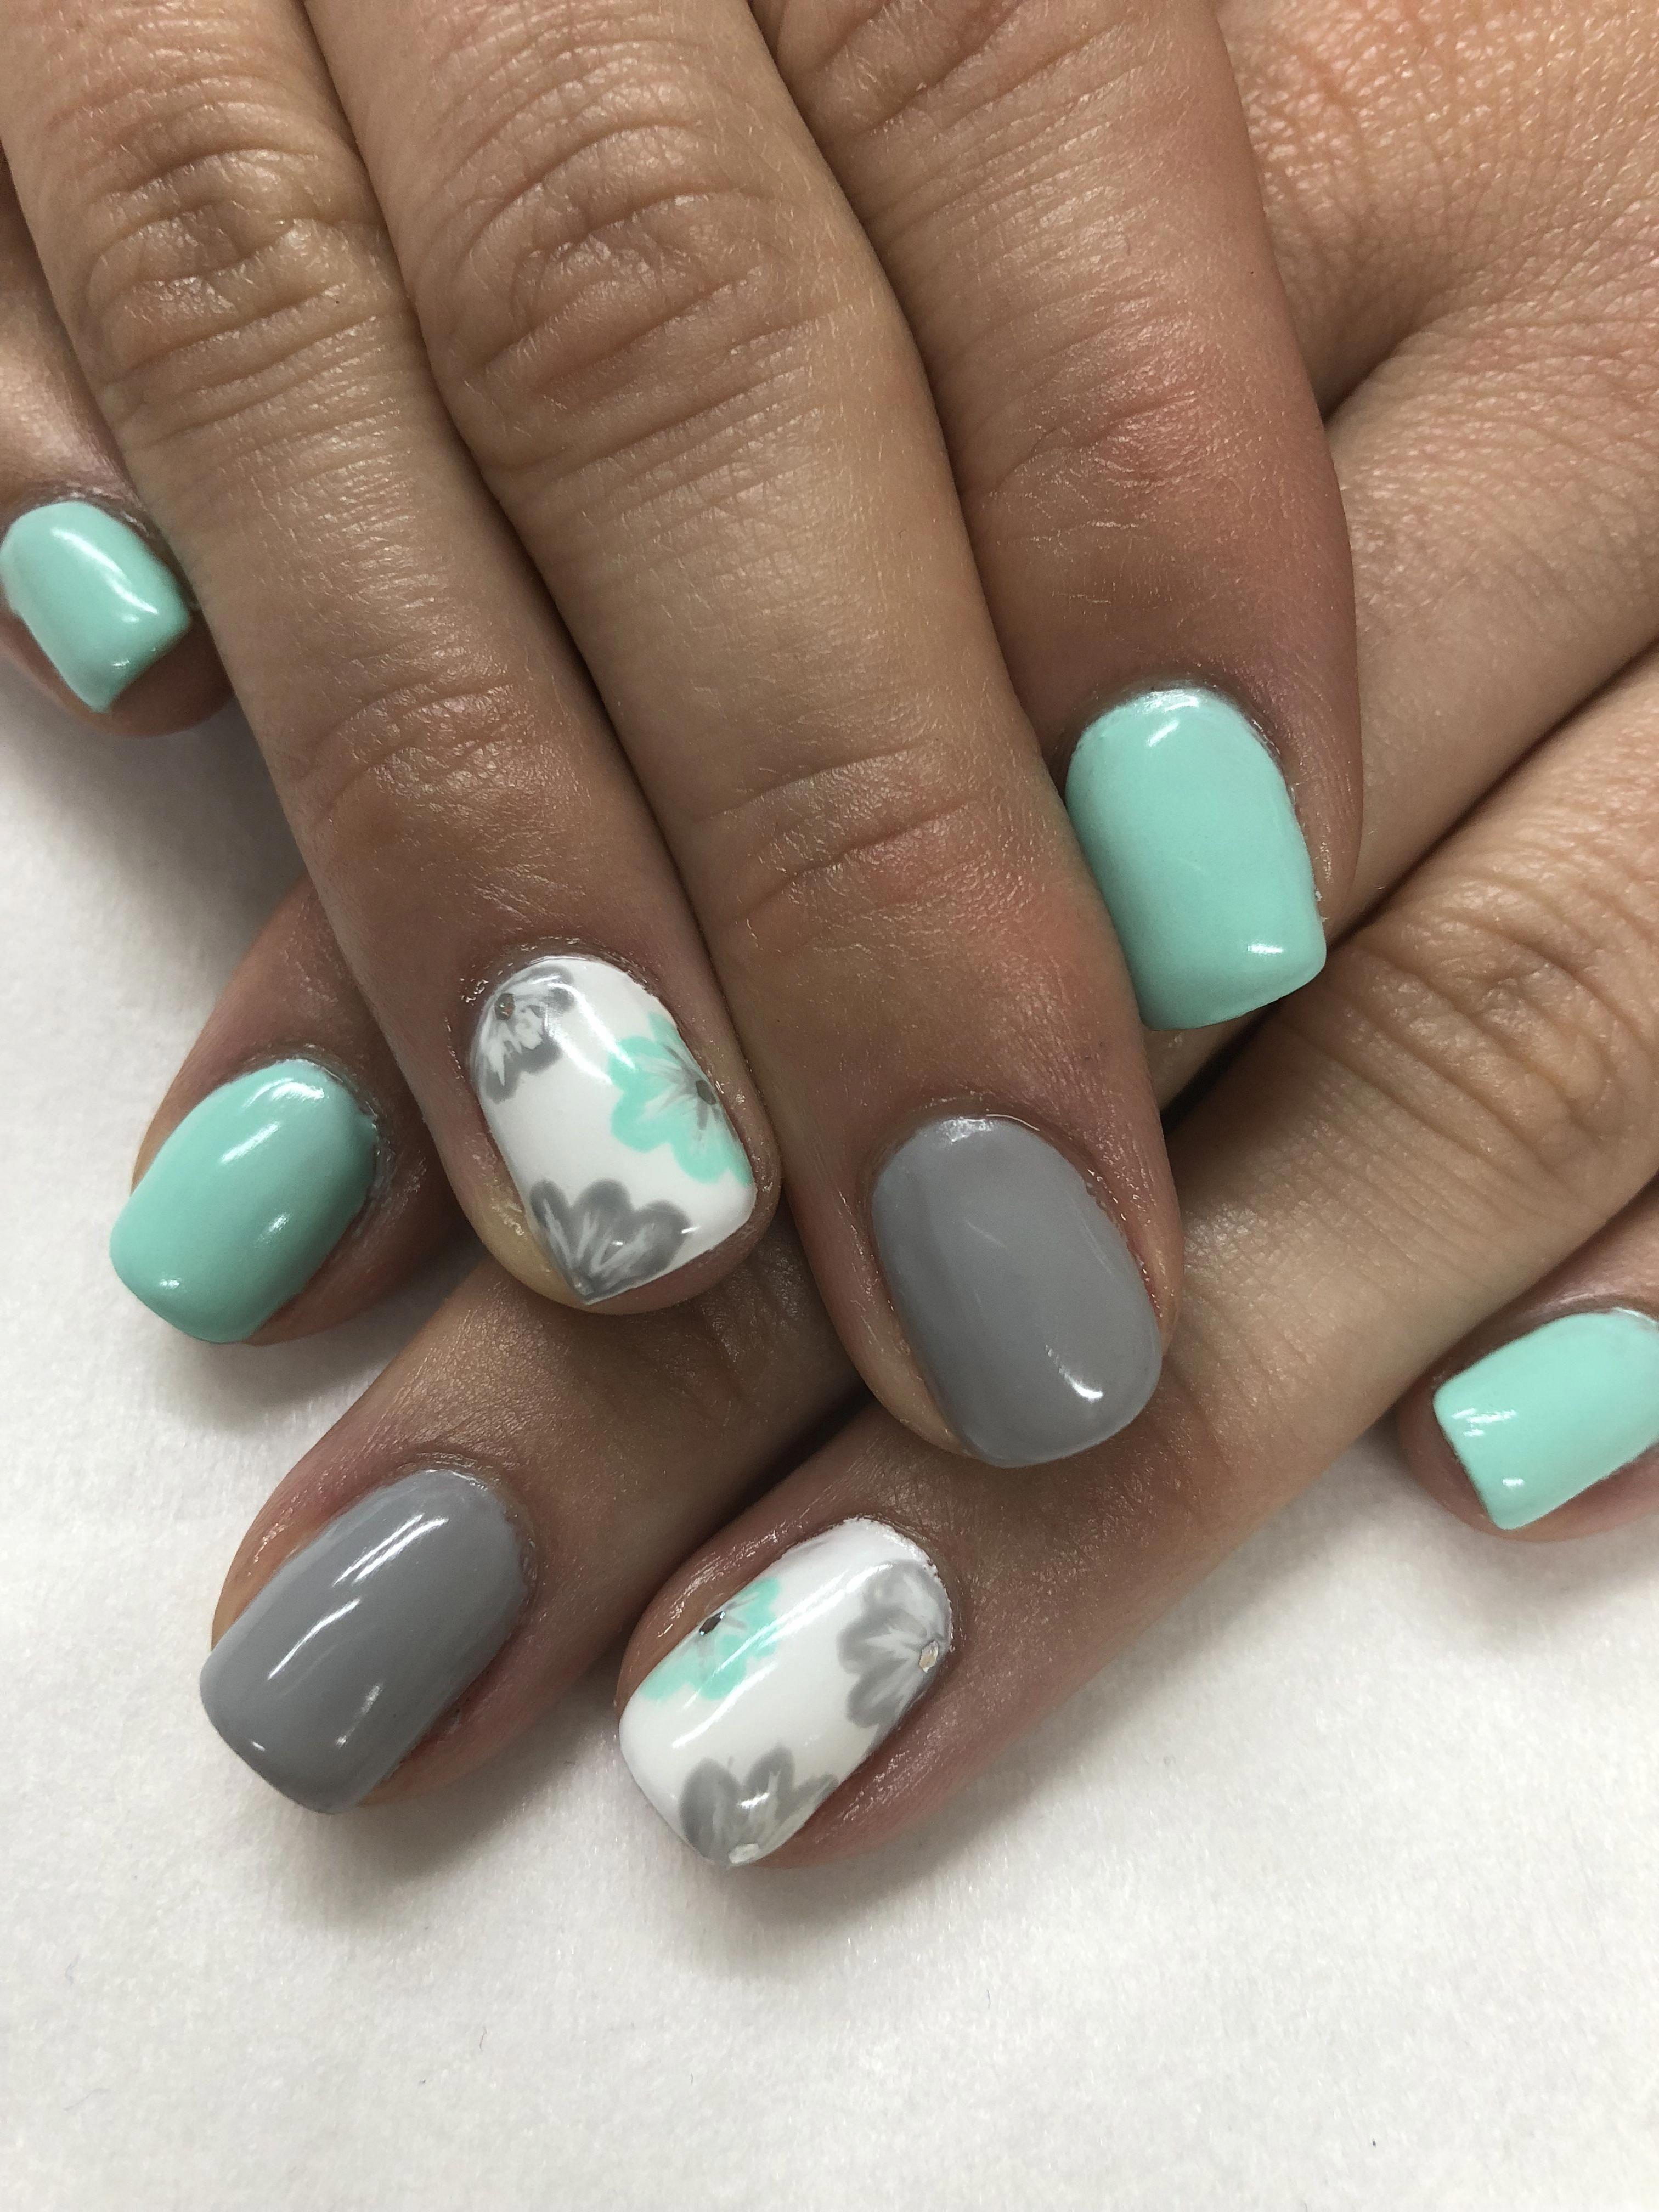 30+ Gel Nail Art Designs & Ideas 2016 | Fabulous Nail Art